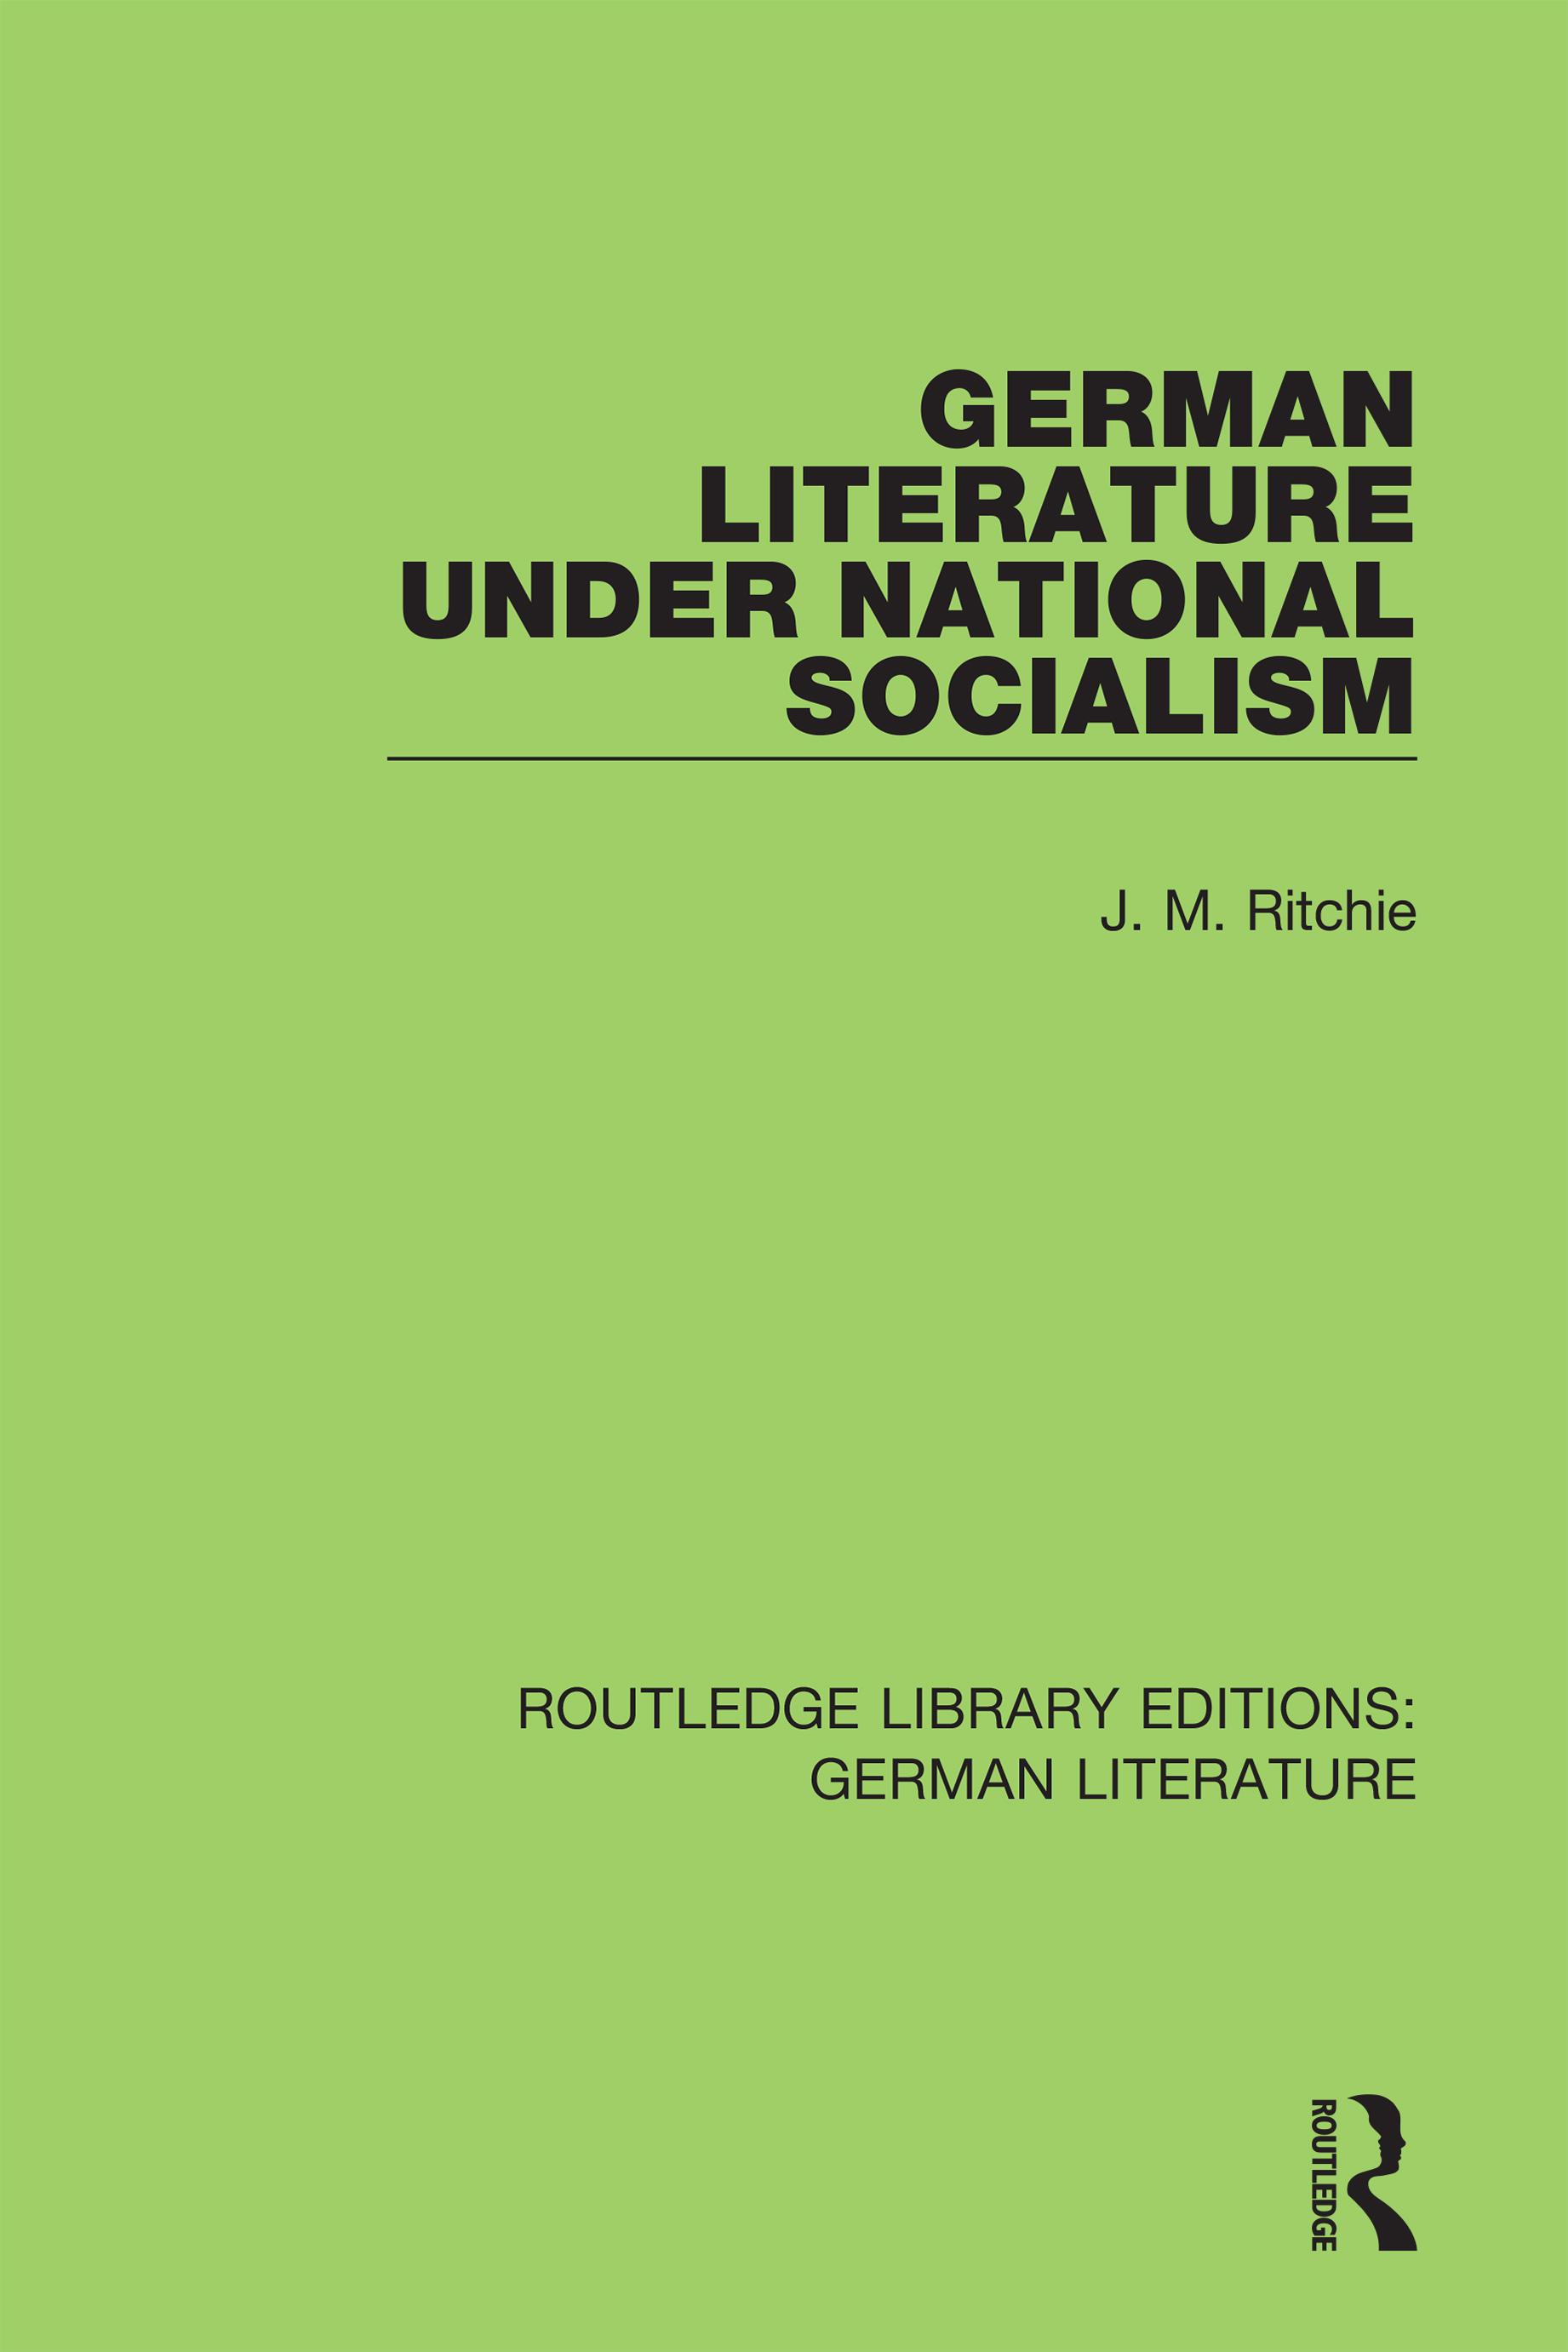 German Literature under National Socialism book cover